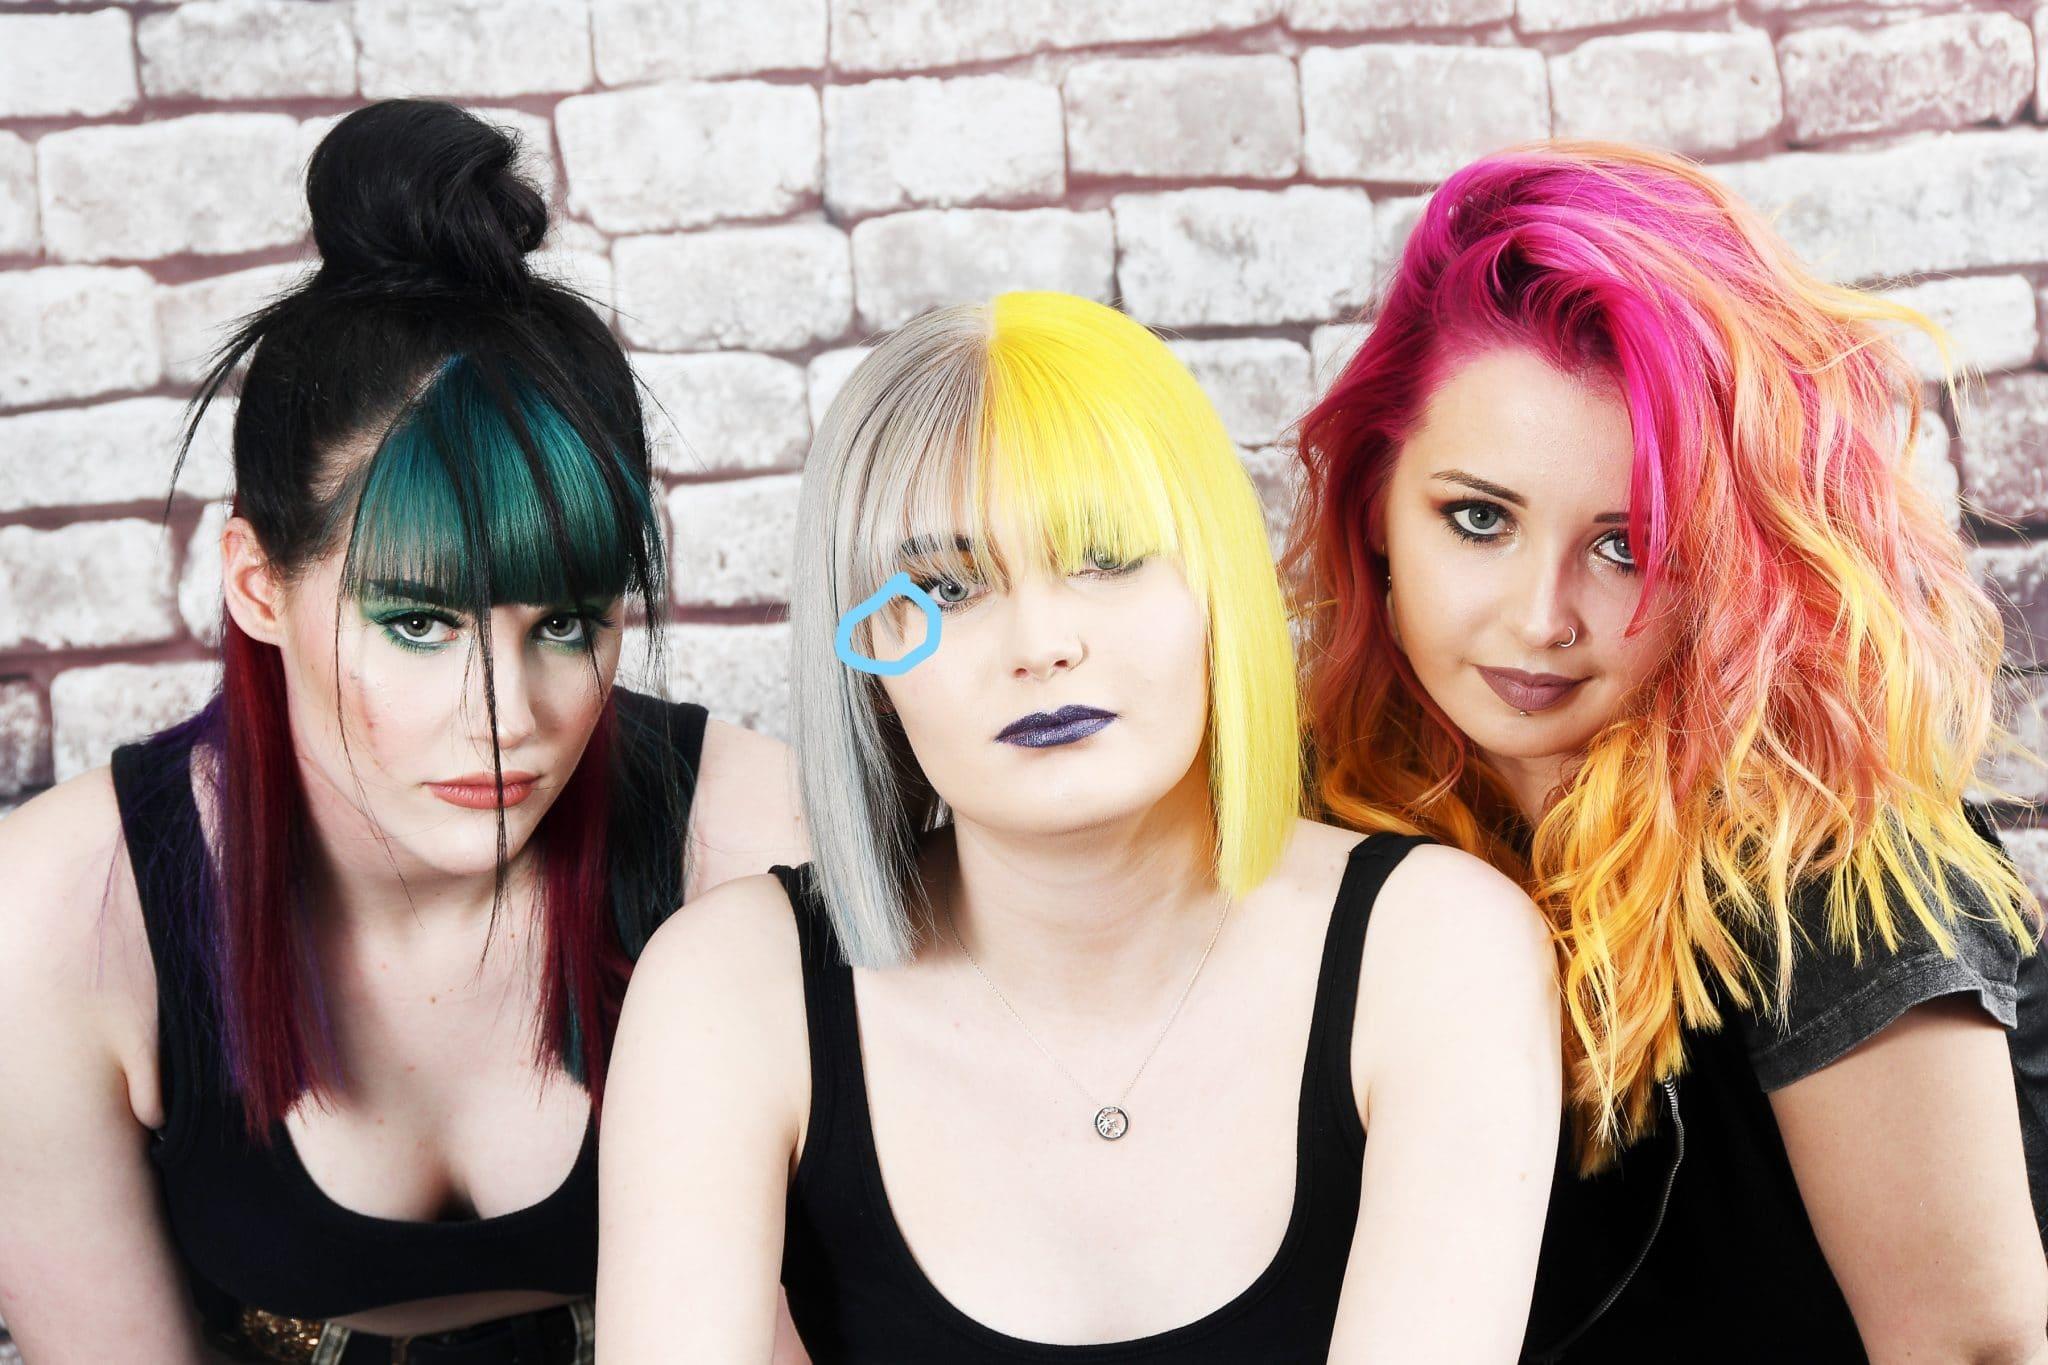 3 Women - Different Bright Hair Styles